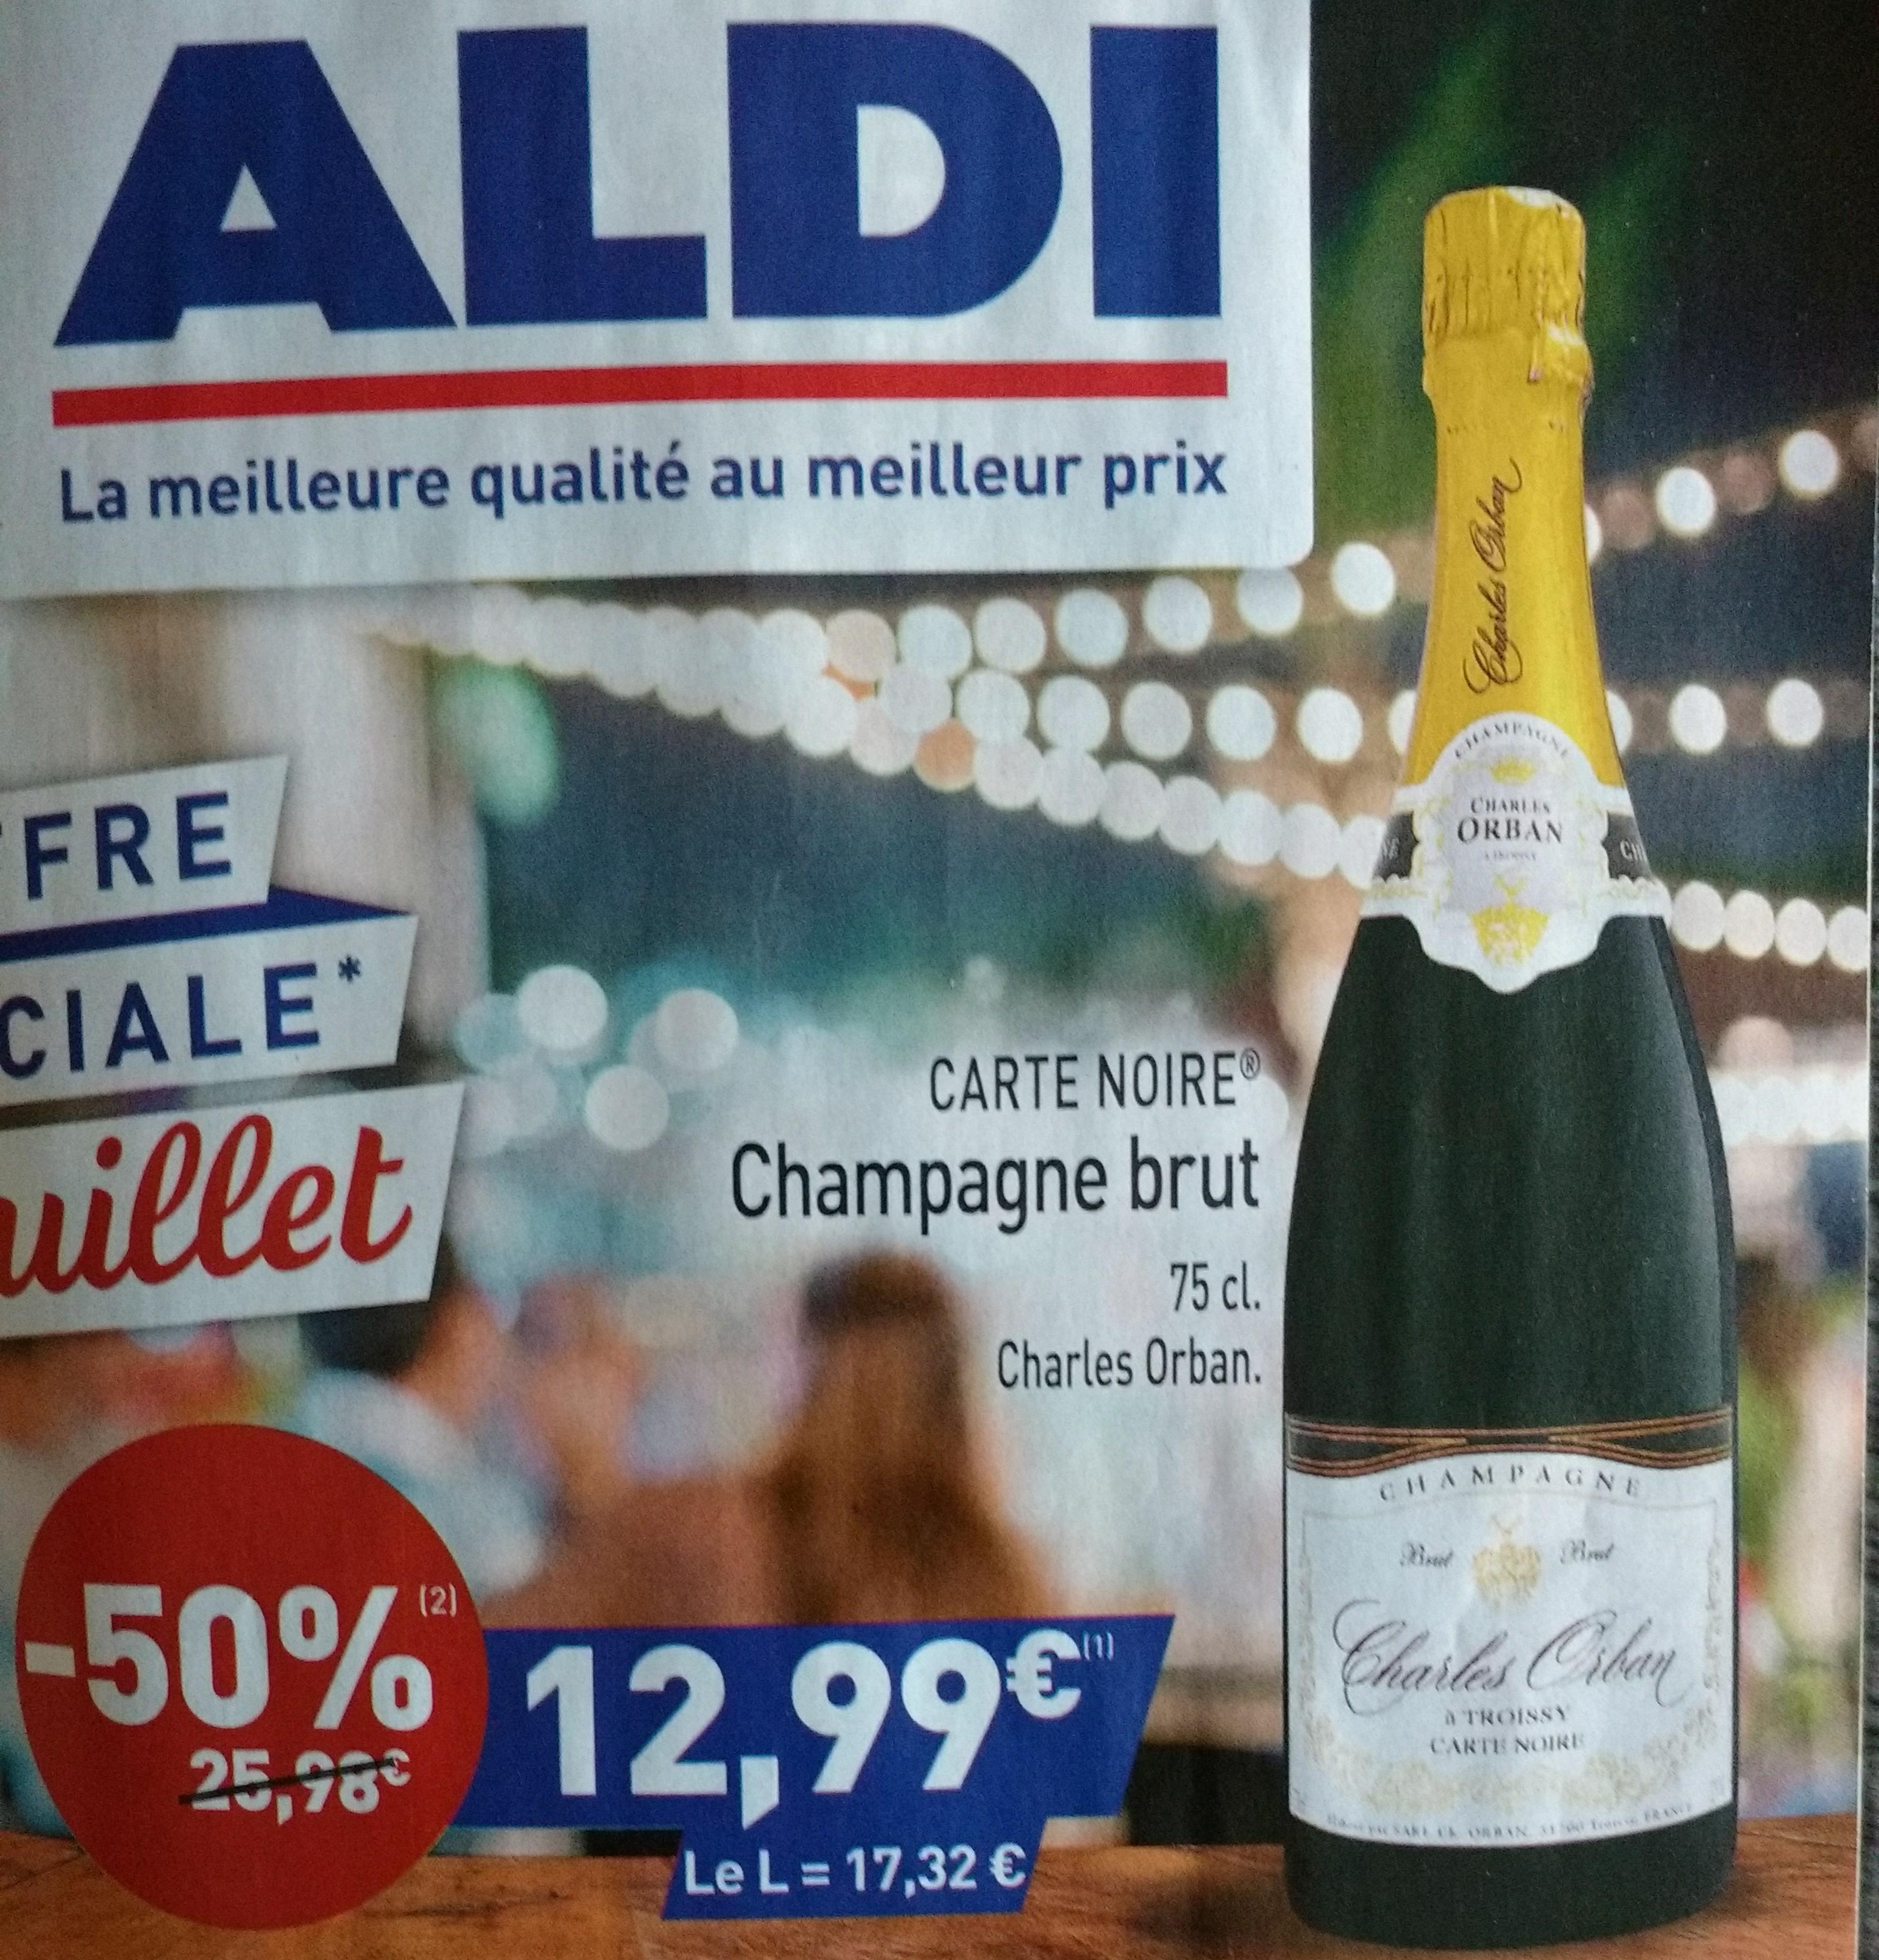 Champagne brut - 75cl